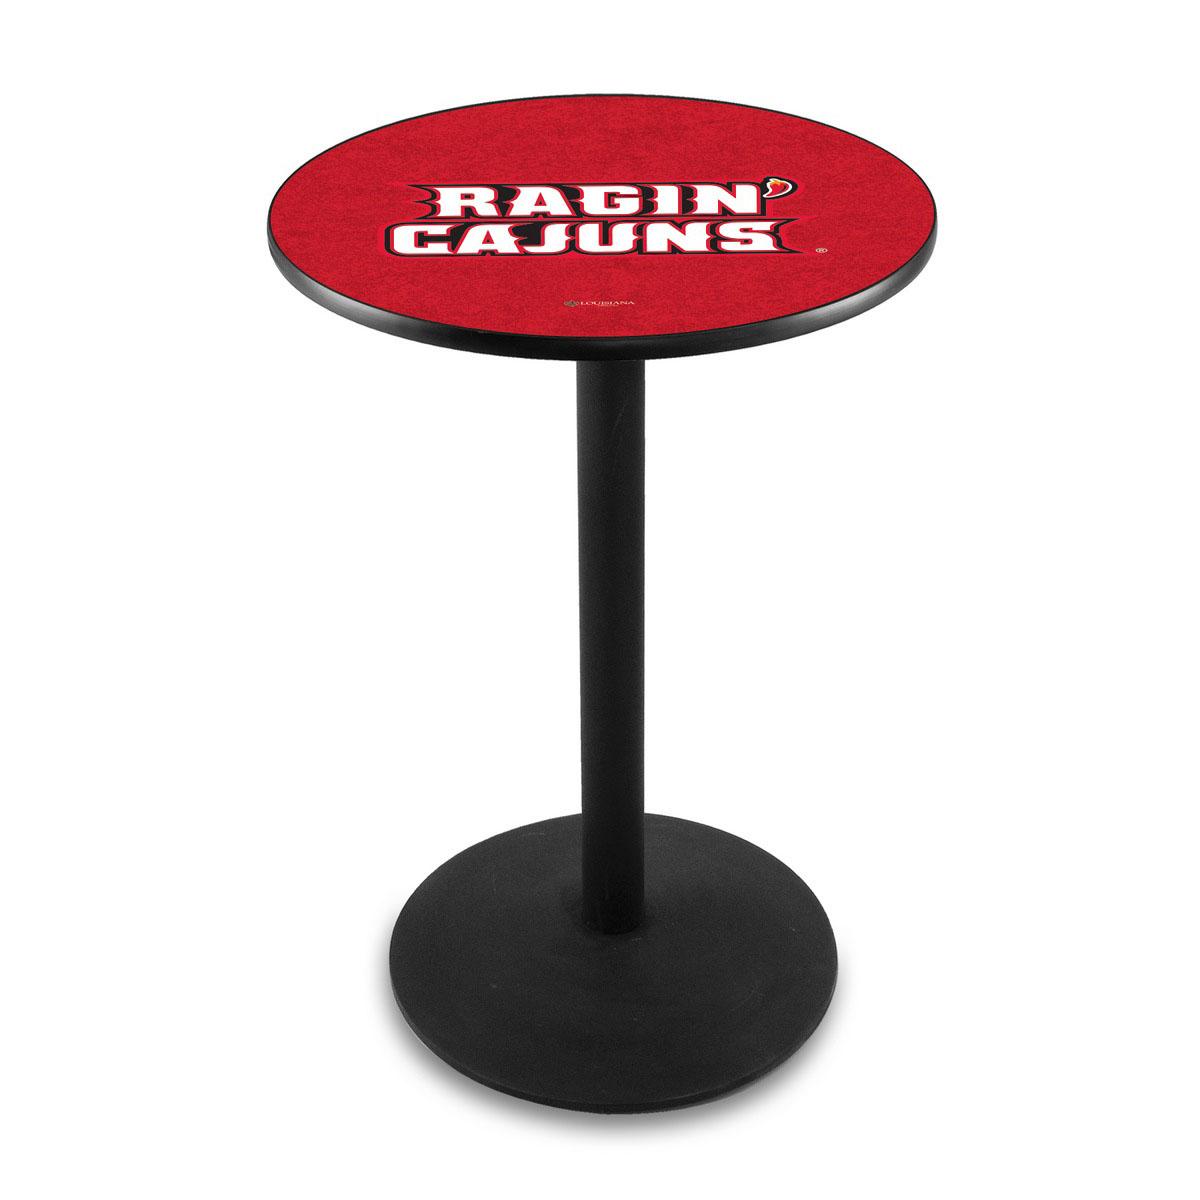 Impressive University Louisiana At Lafayette Logo Pub Bar Table Round Stand Product Photo